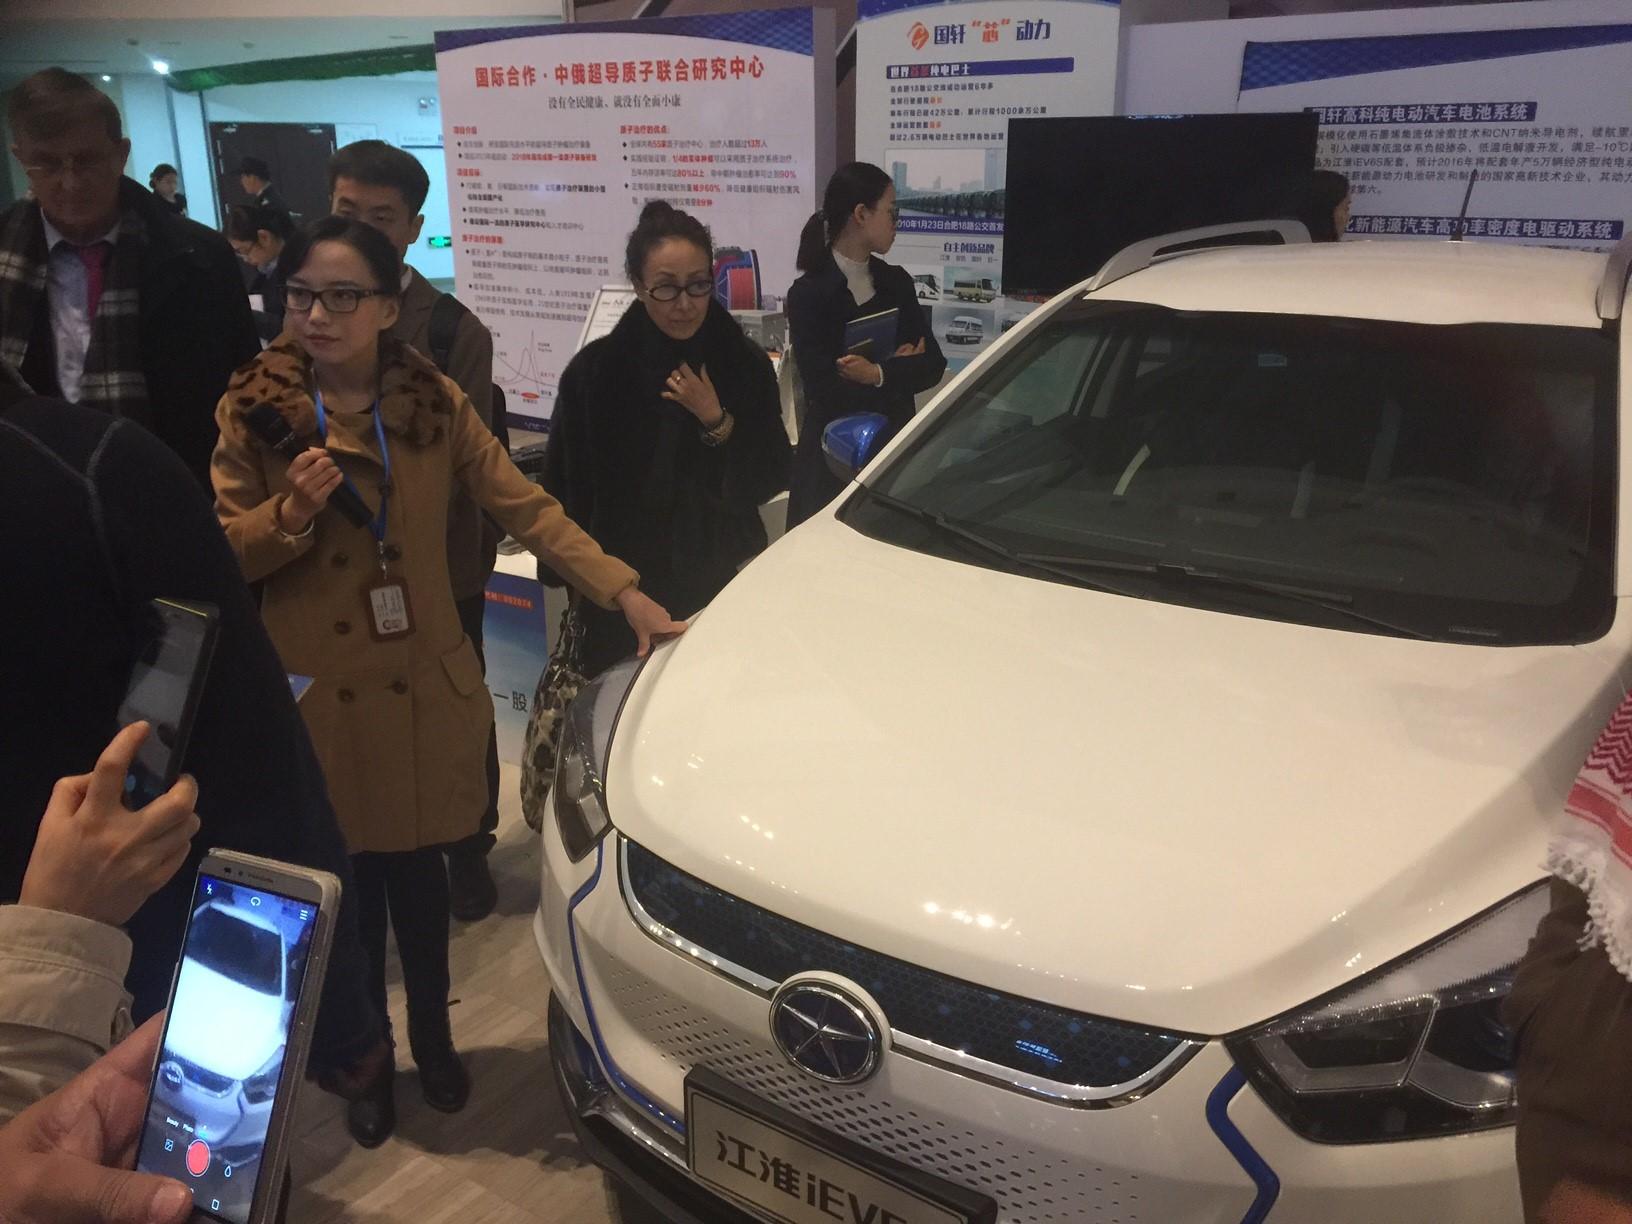 CAPAStudyAbroad_Shanghai_Fall2016_From Colin Speakman - Innovation column6.jpg